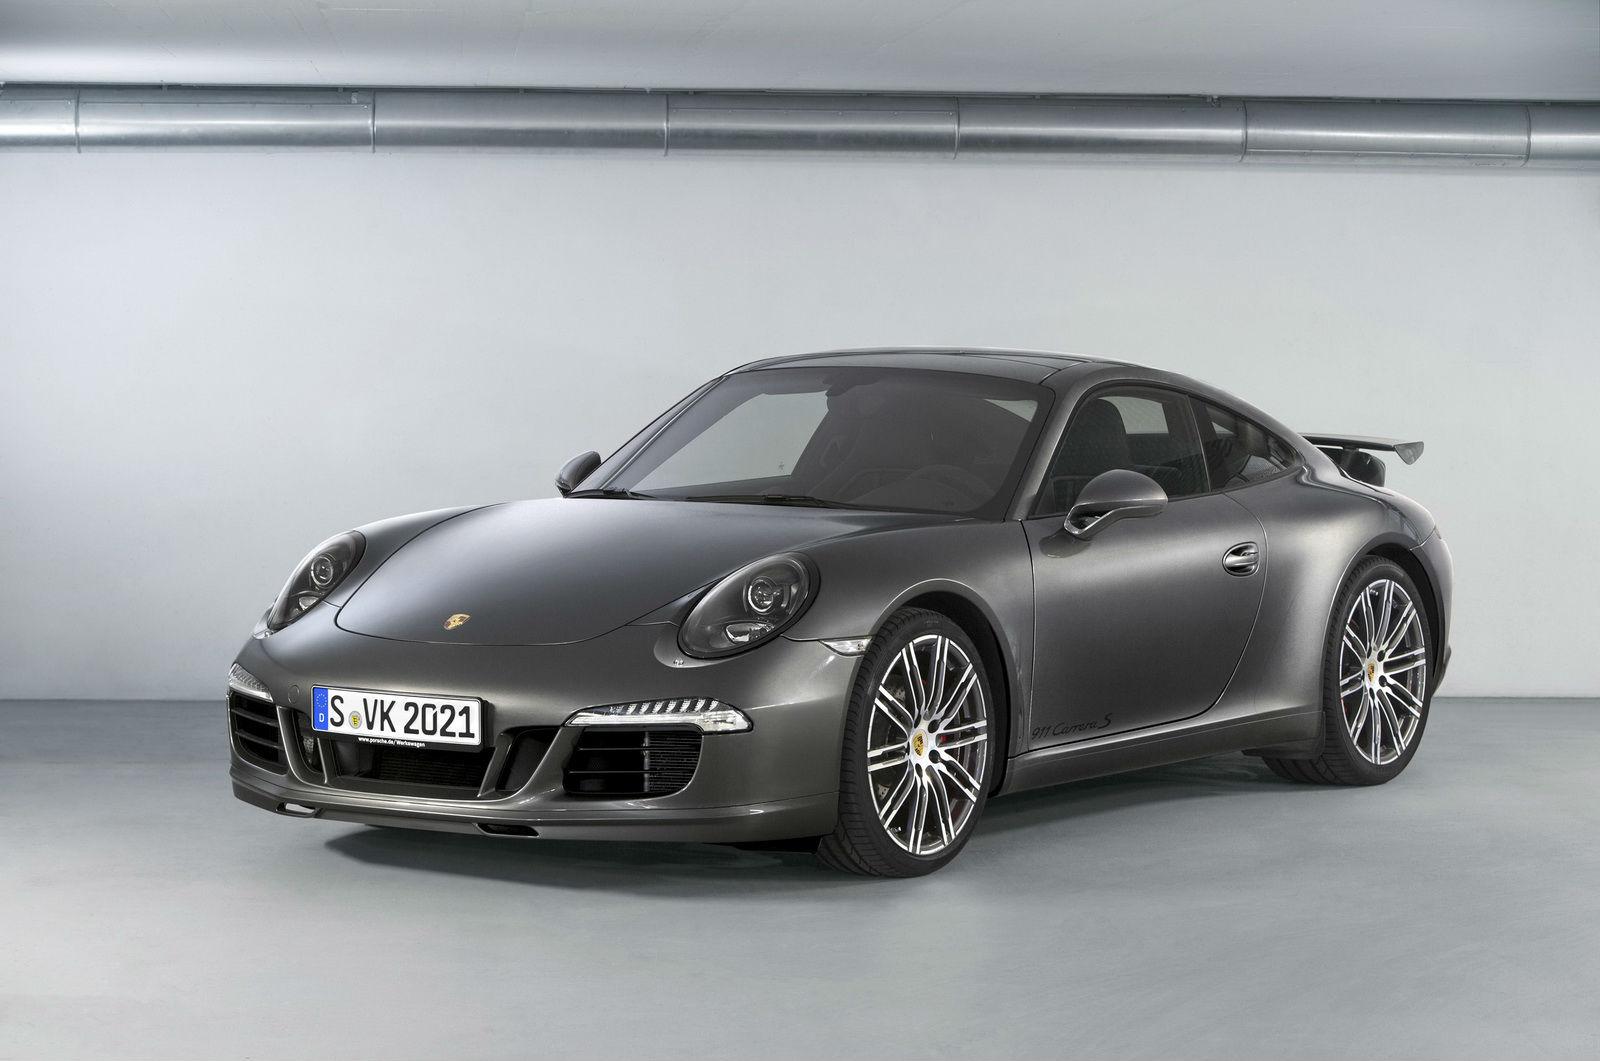 Porsche 911 Carrera S Tequipment